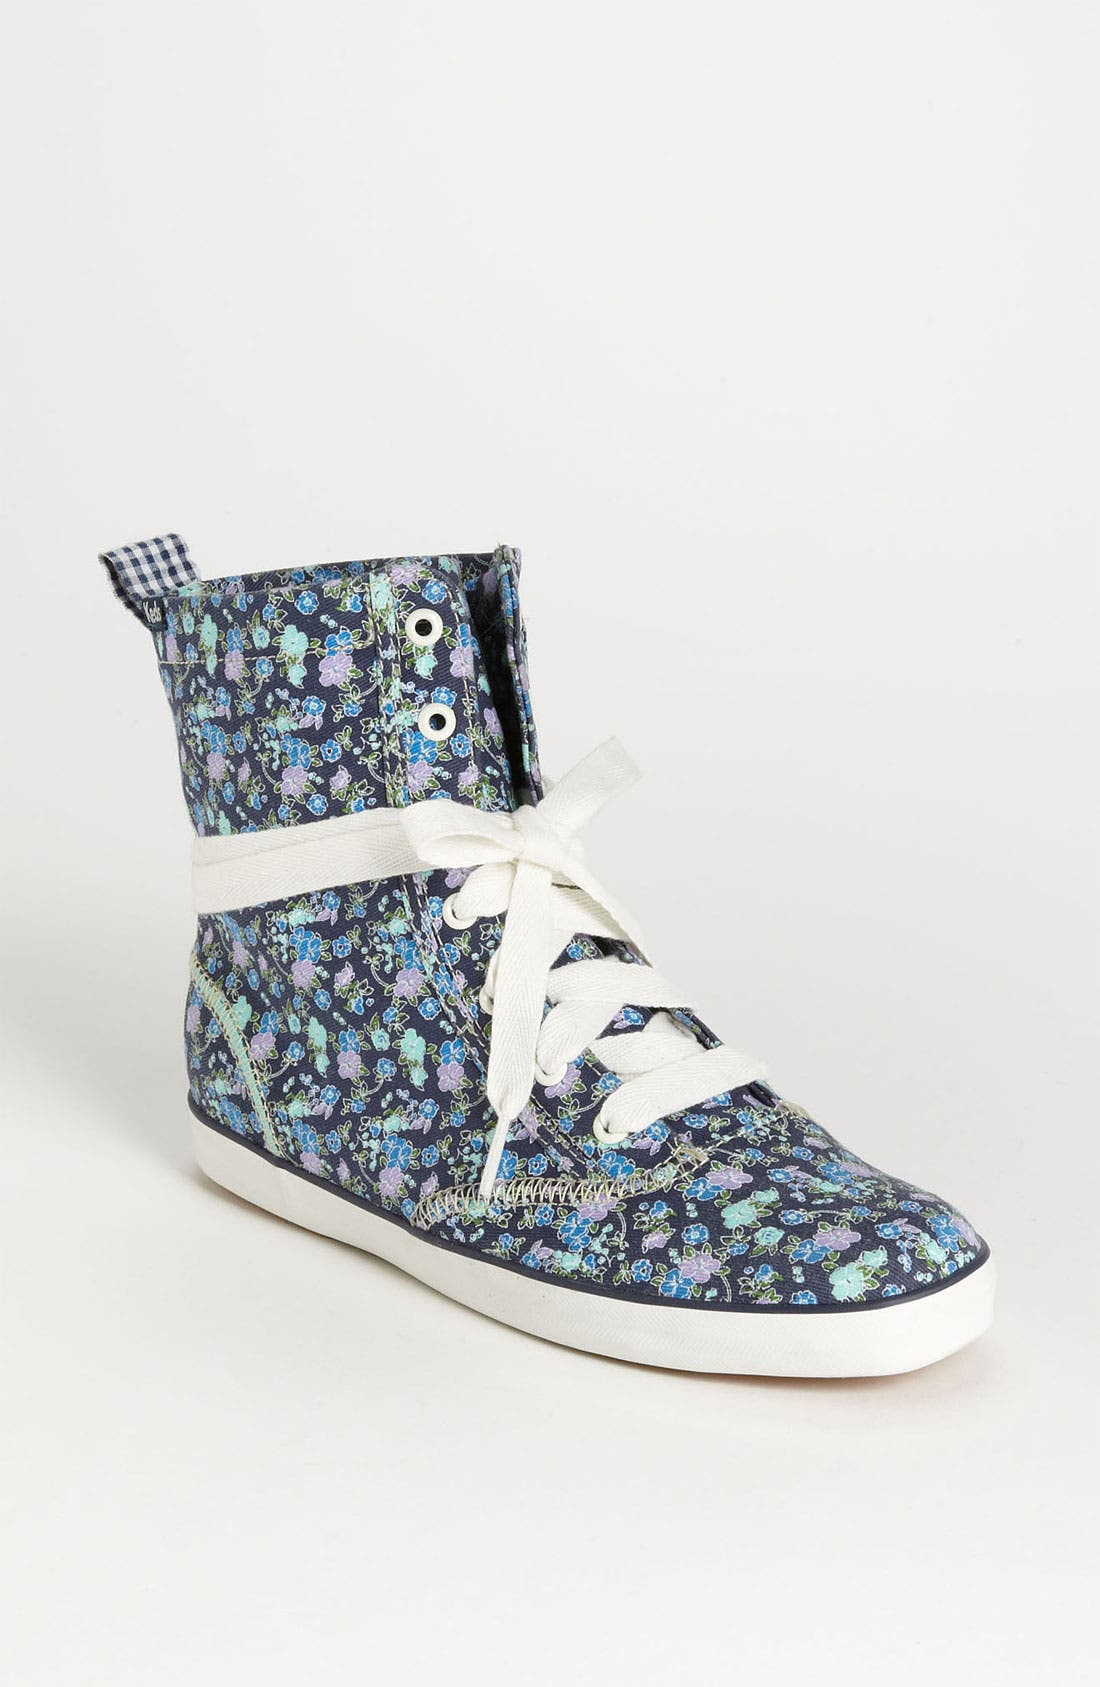 Alternate Image 1 Selected - Keds® 'January' Sneaker Boot (Women)